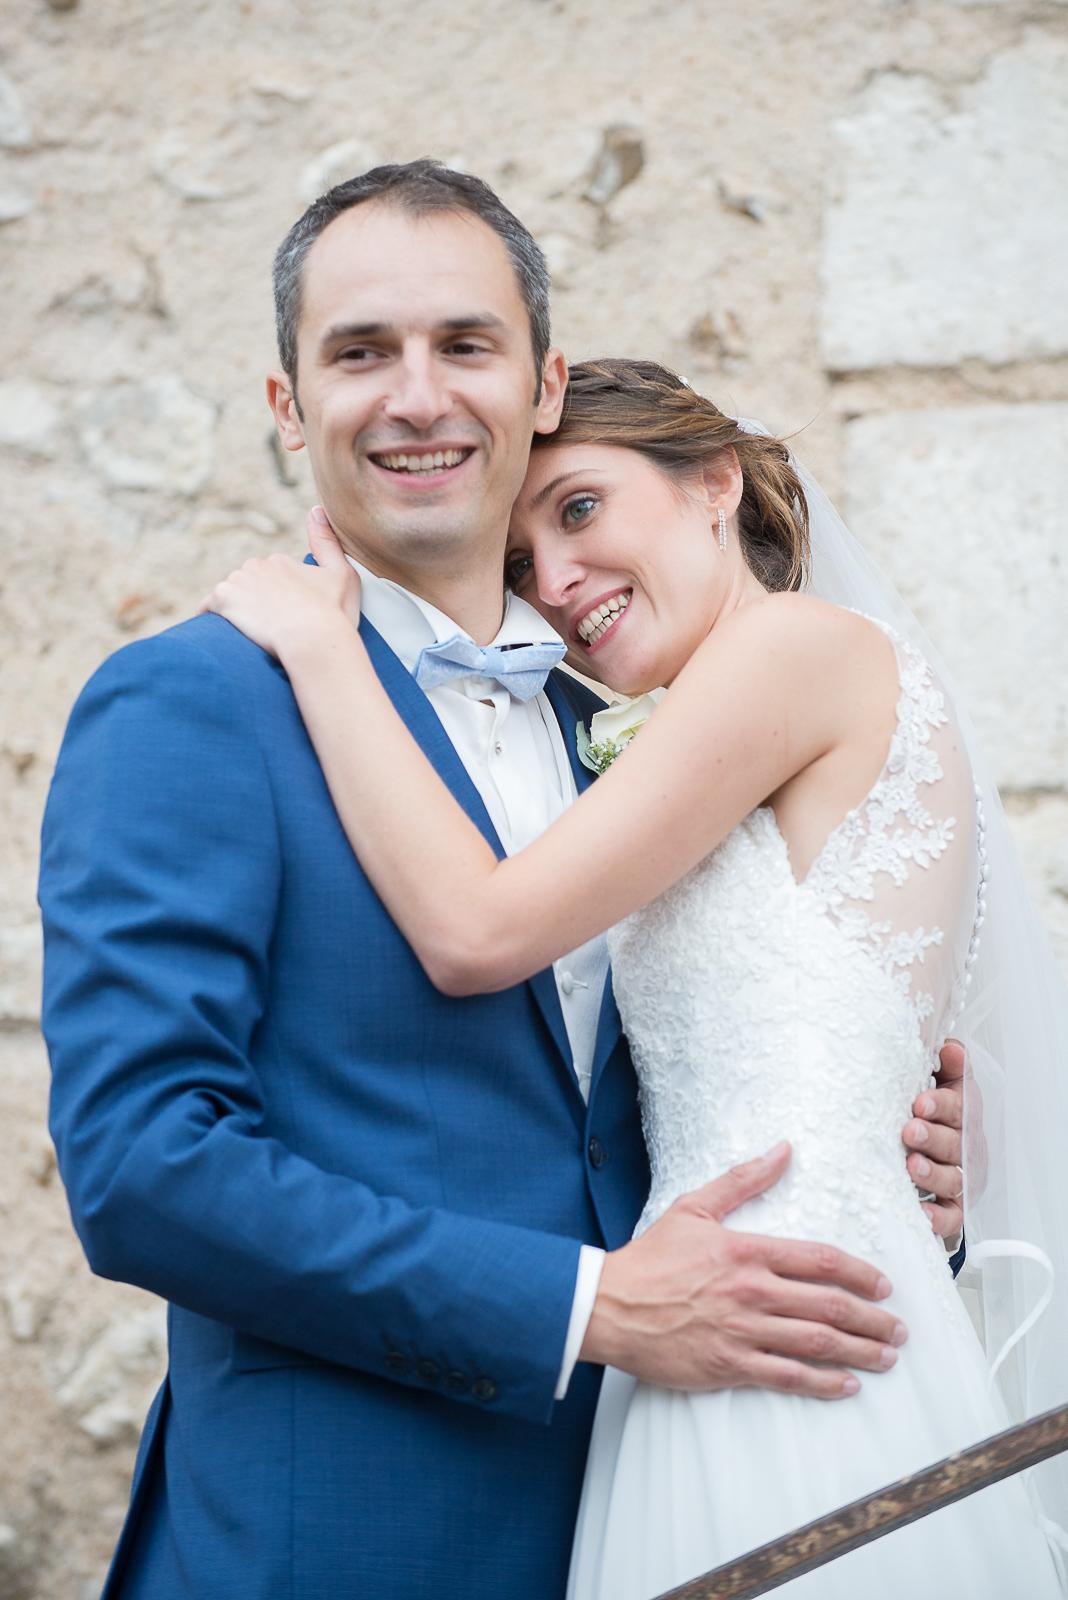 Mariage de Marine-Sophie & Laurent